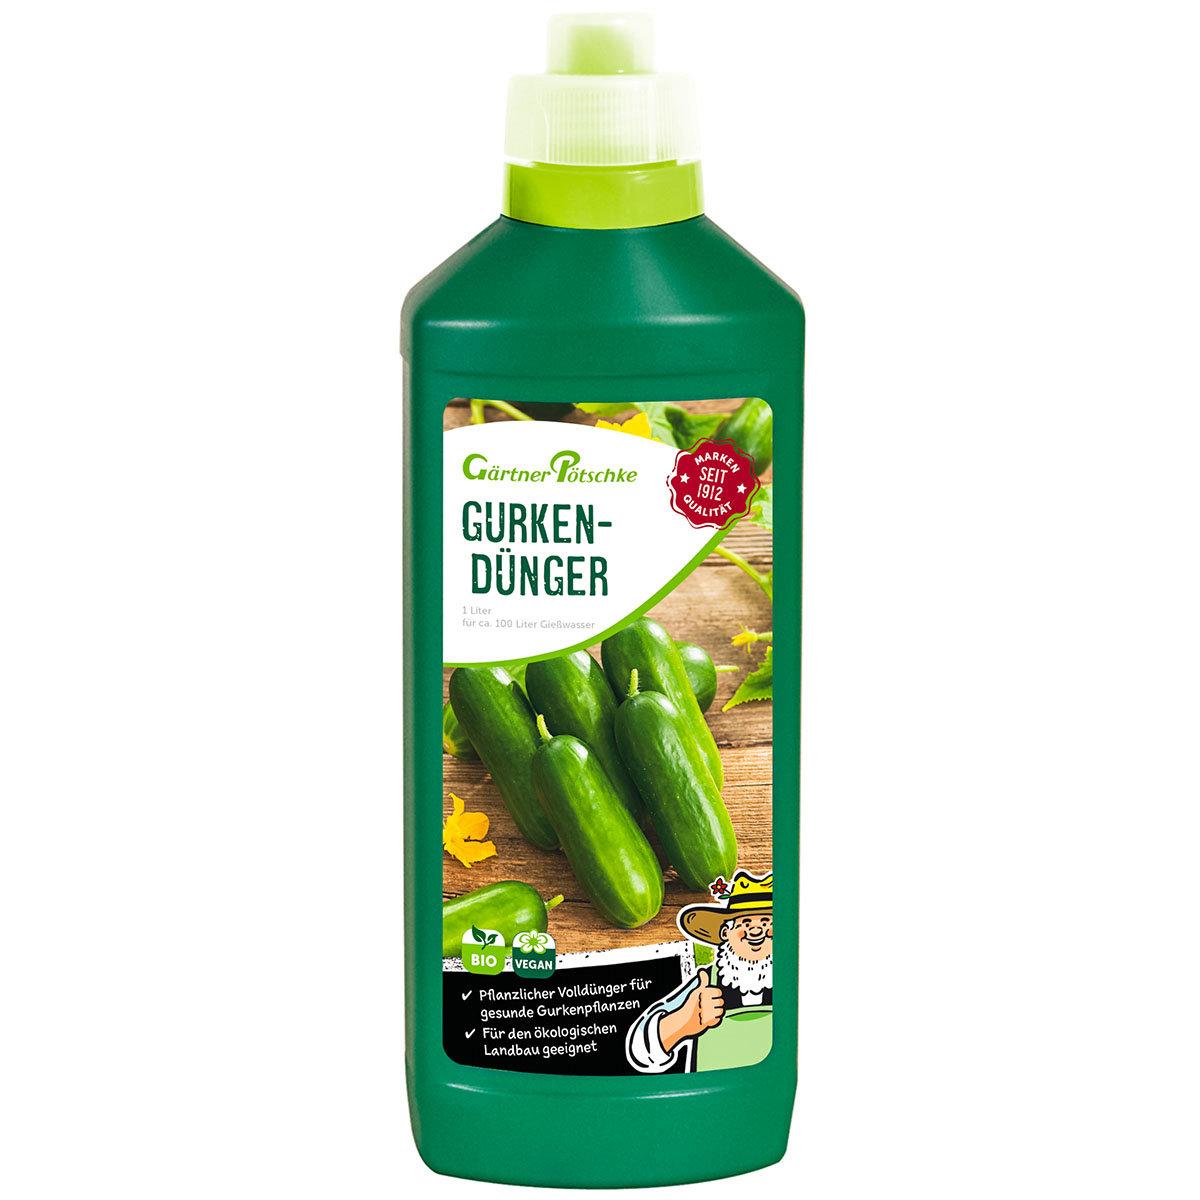 Gurken-Dünger flüssig, 1 l